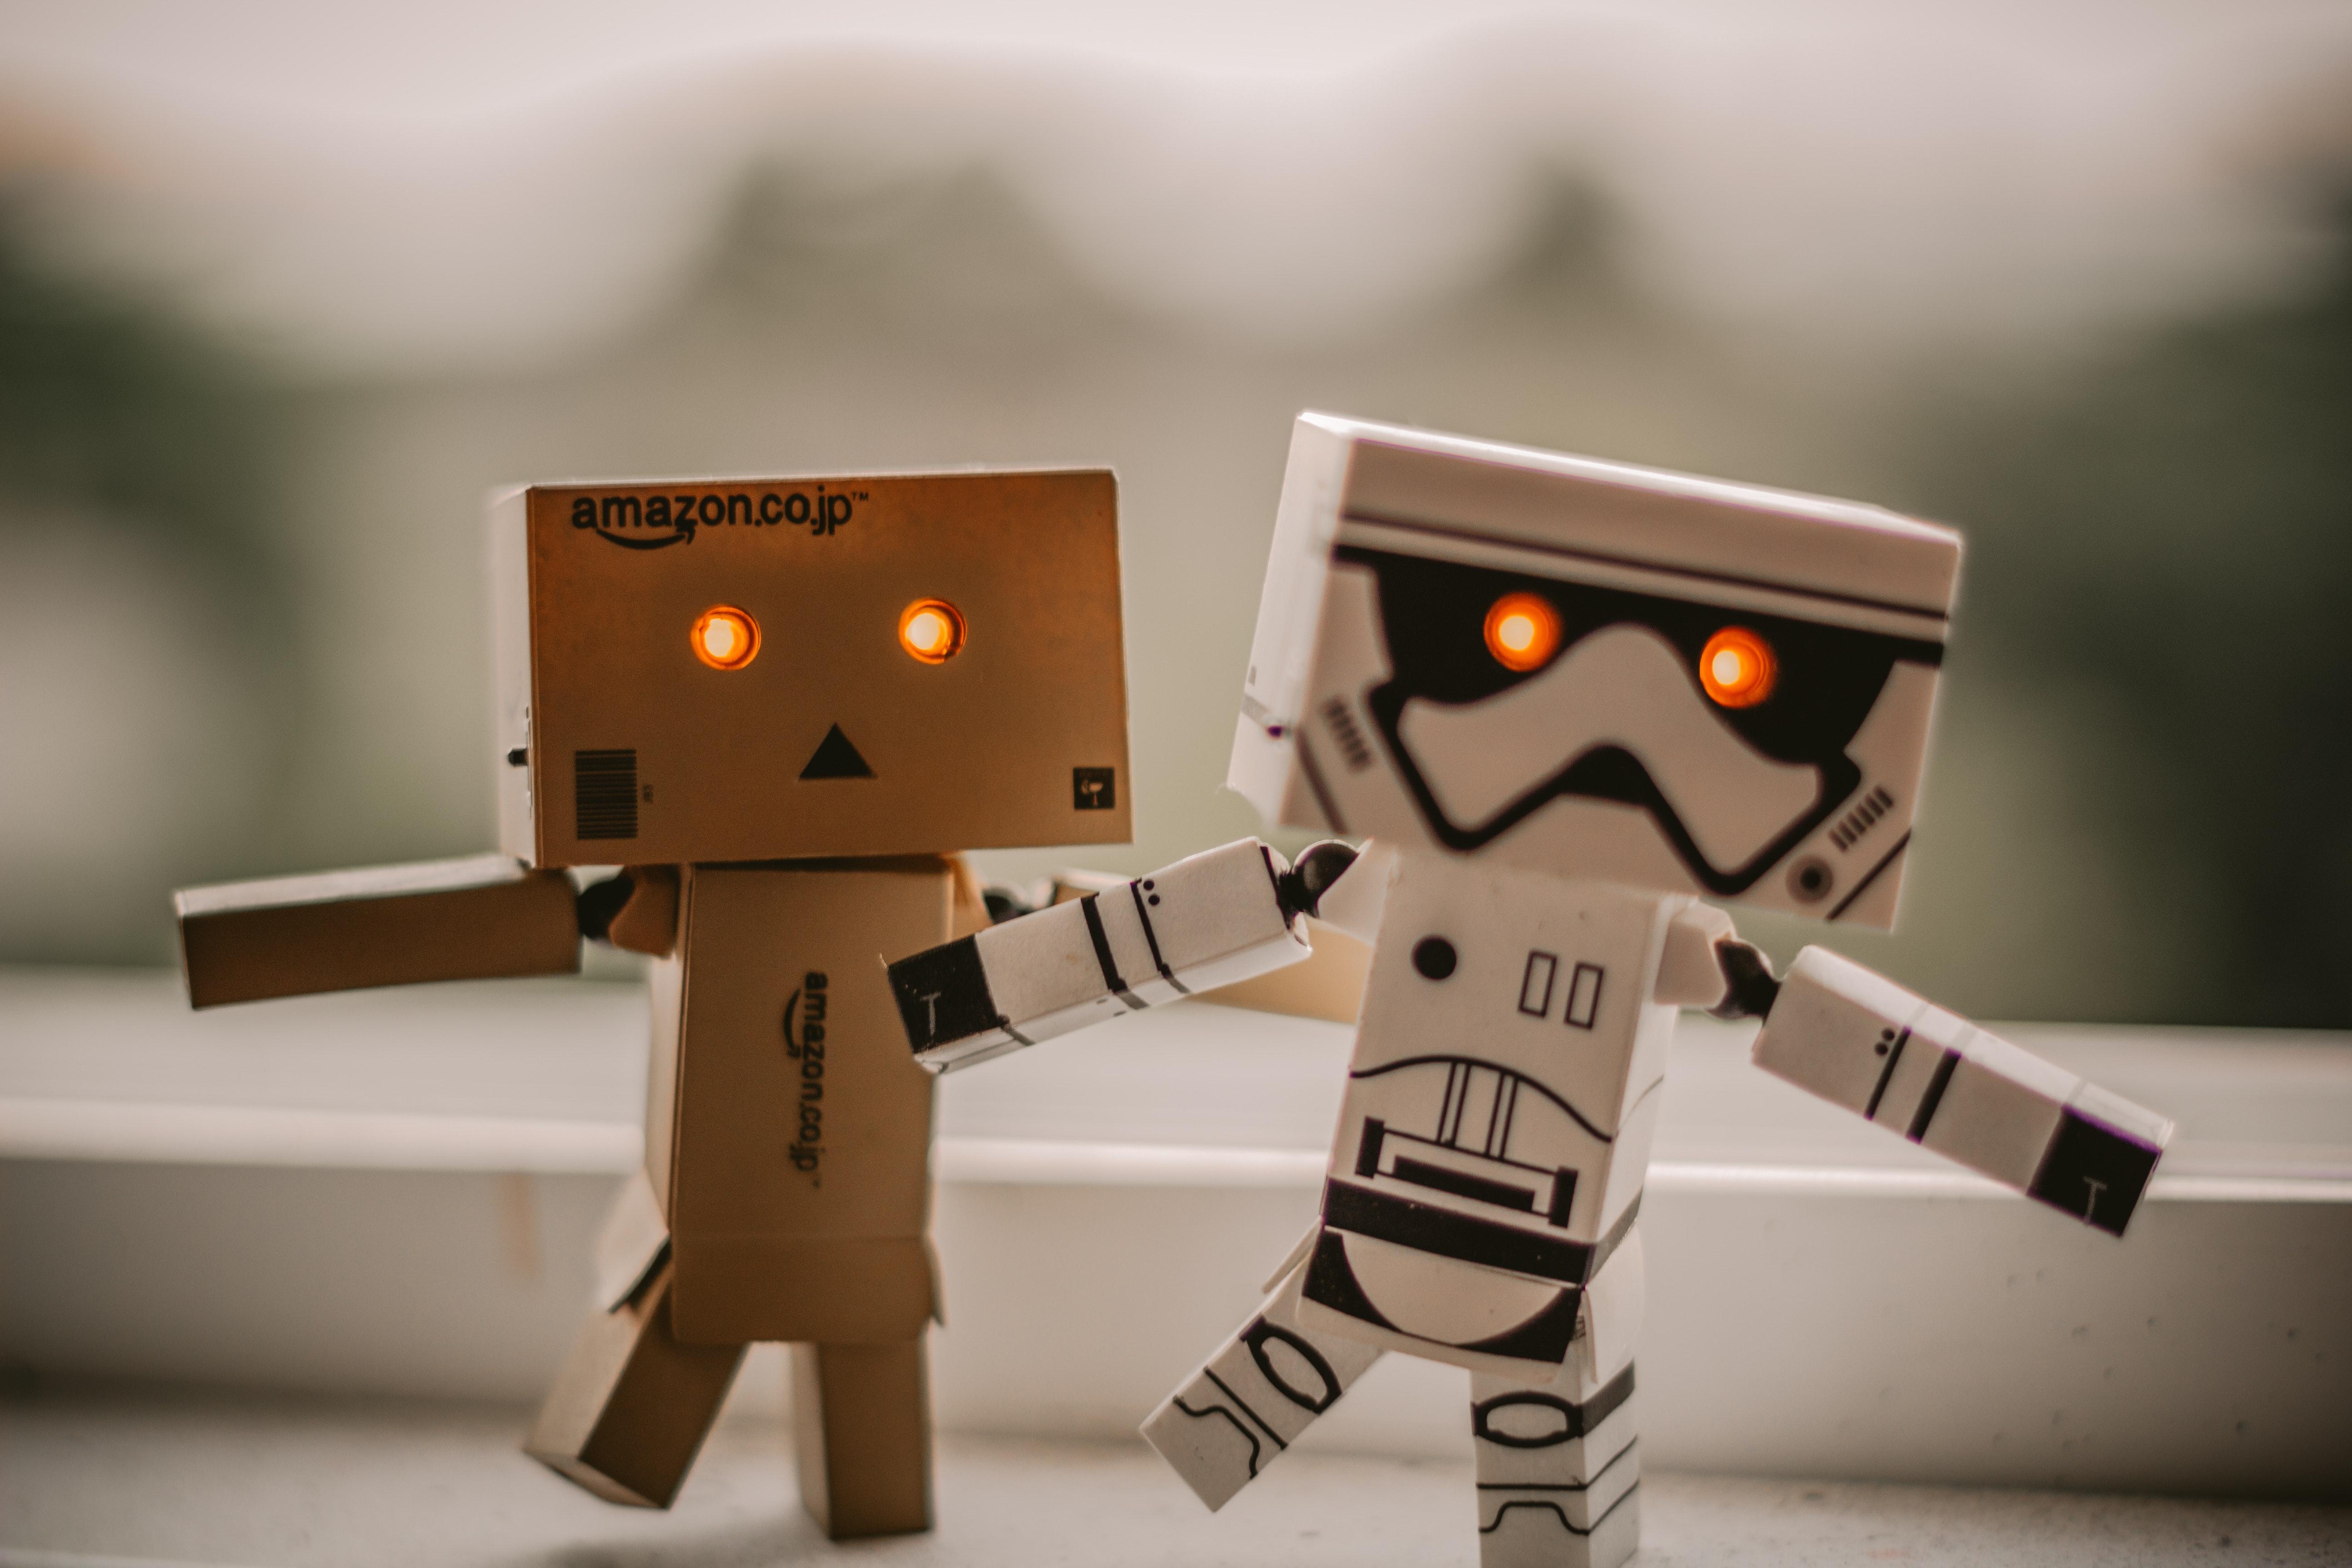 AWS推出RoboMaker,可构建智能机器人应用程序